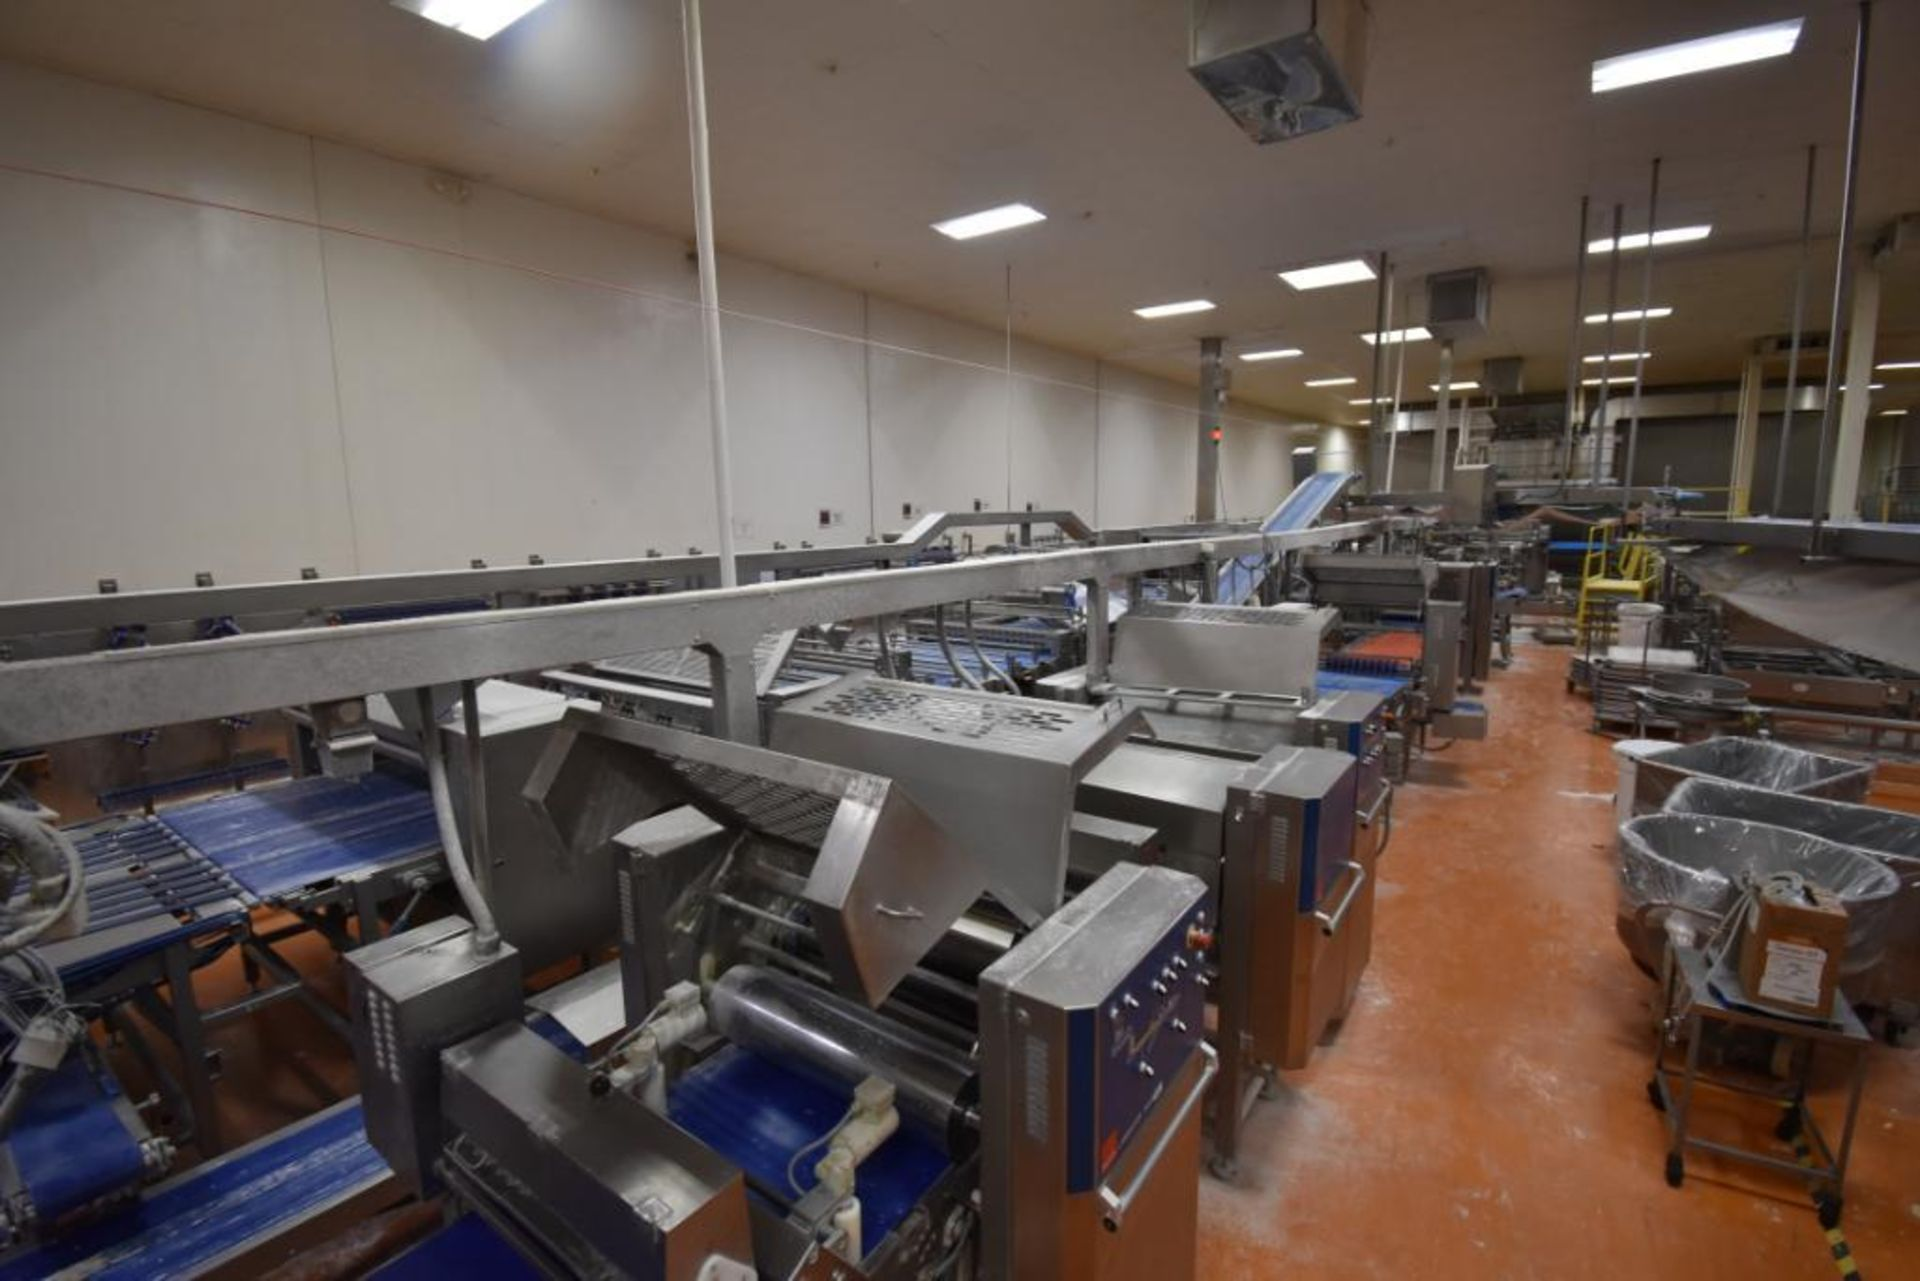 2007 Fritsch Laminator 3000 dough line - Image 259 of 280